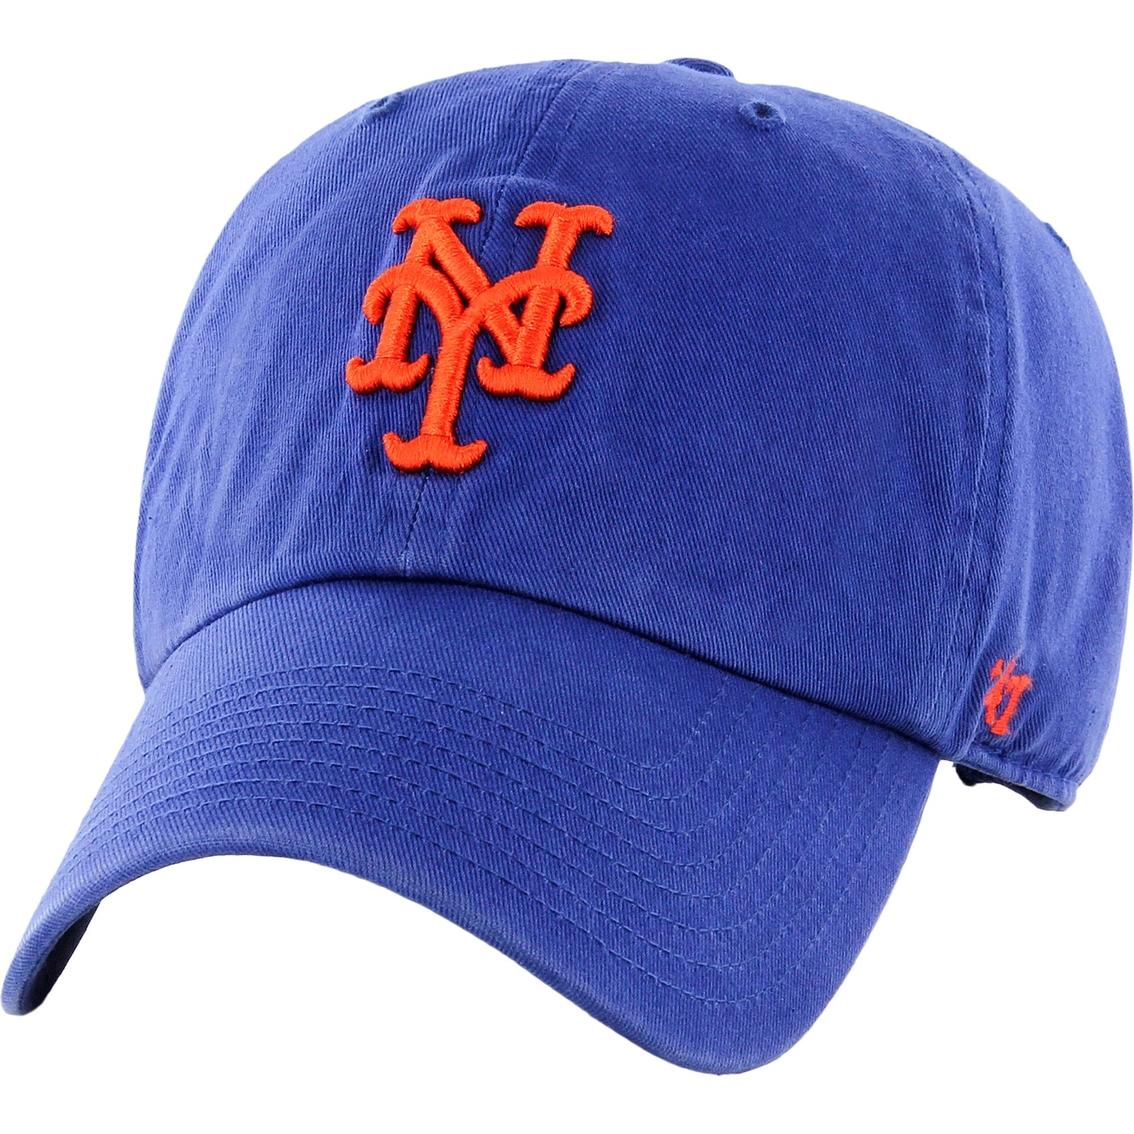 66de42a4d8d 47 Brand Mlb New York Mets Men s Clean Up Baseball Cap